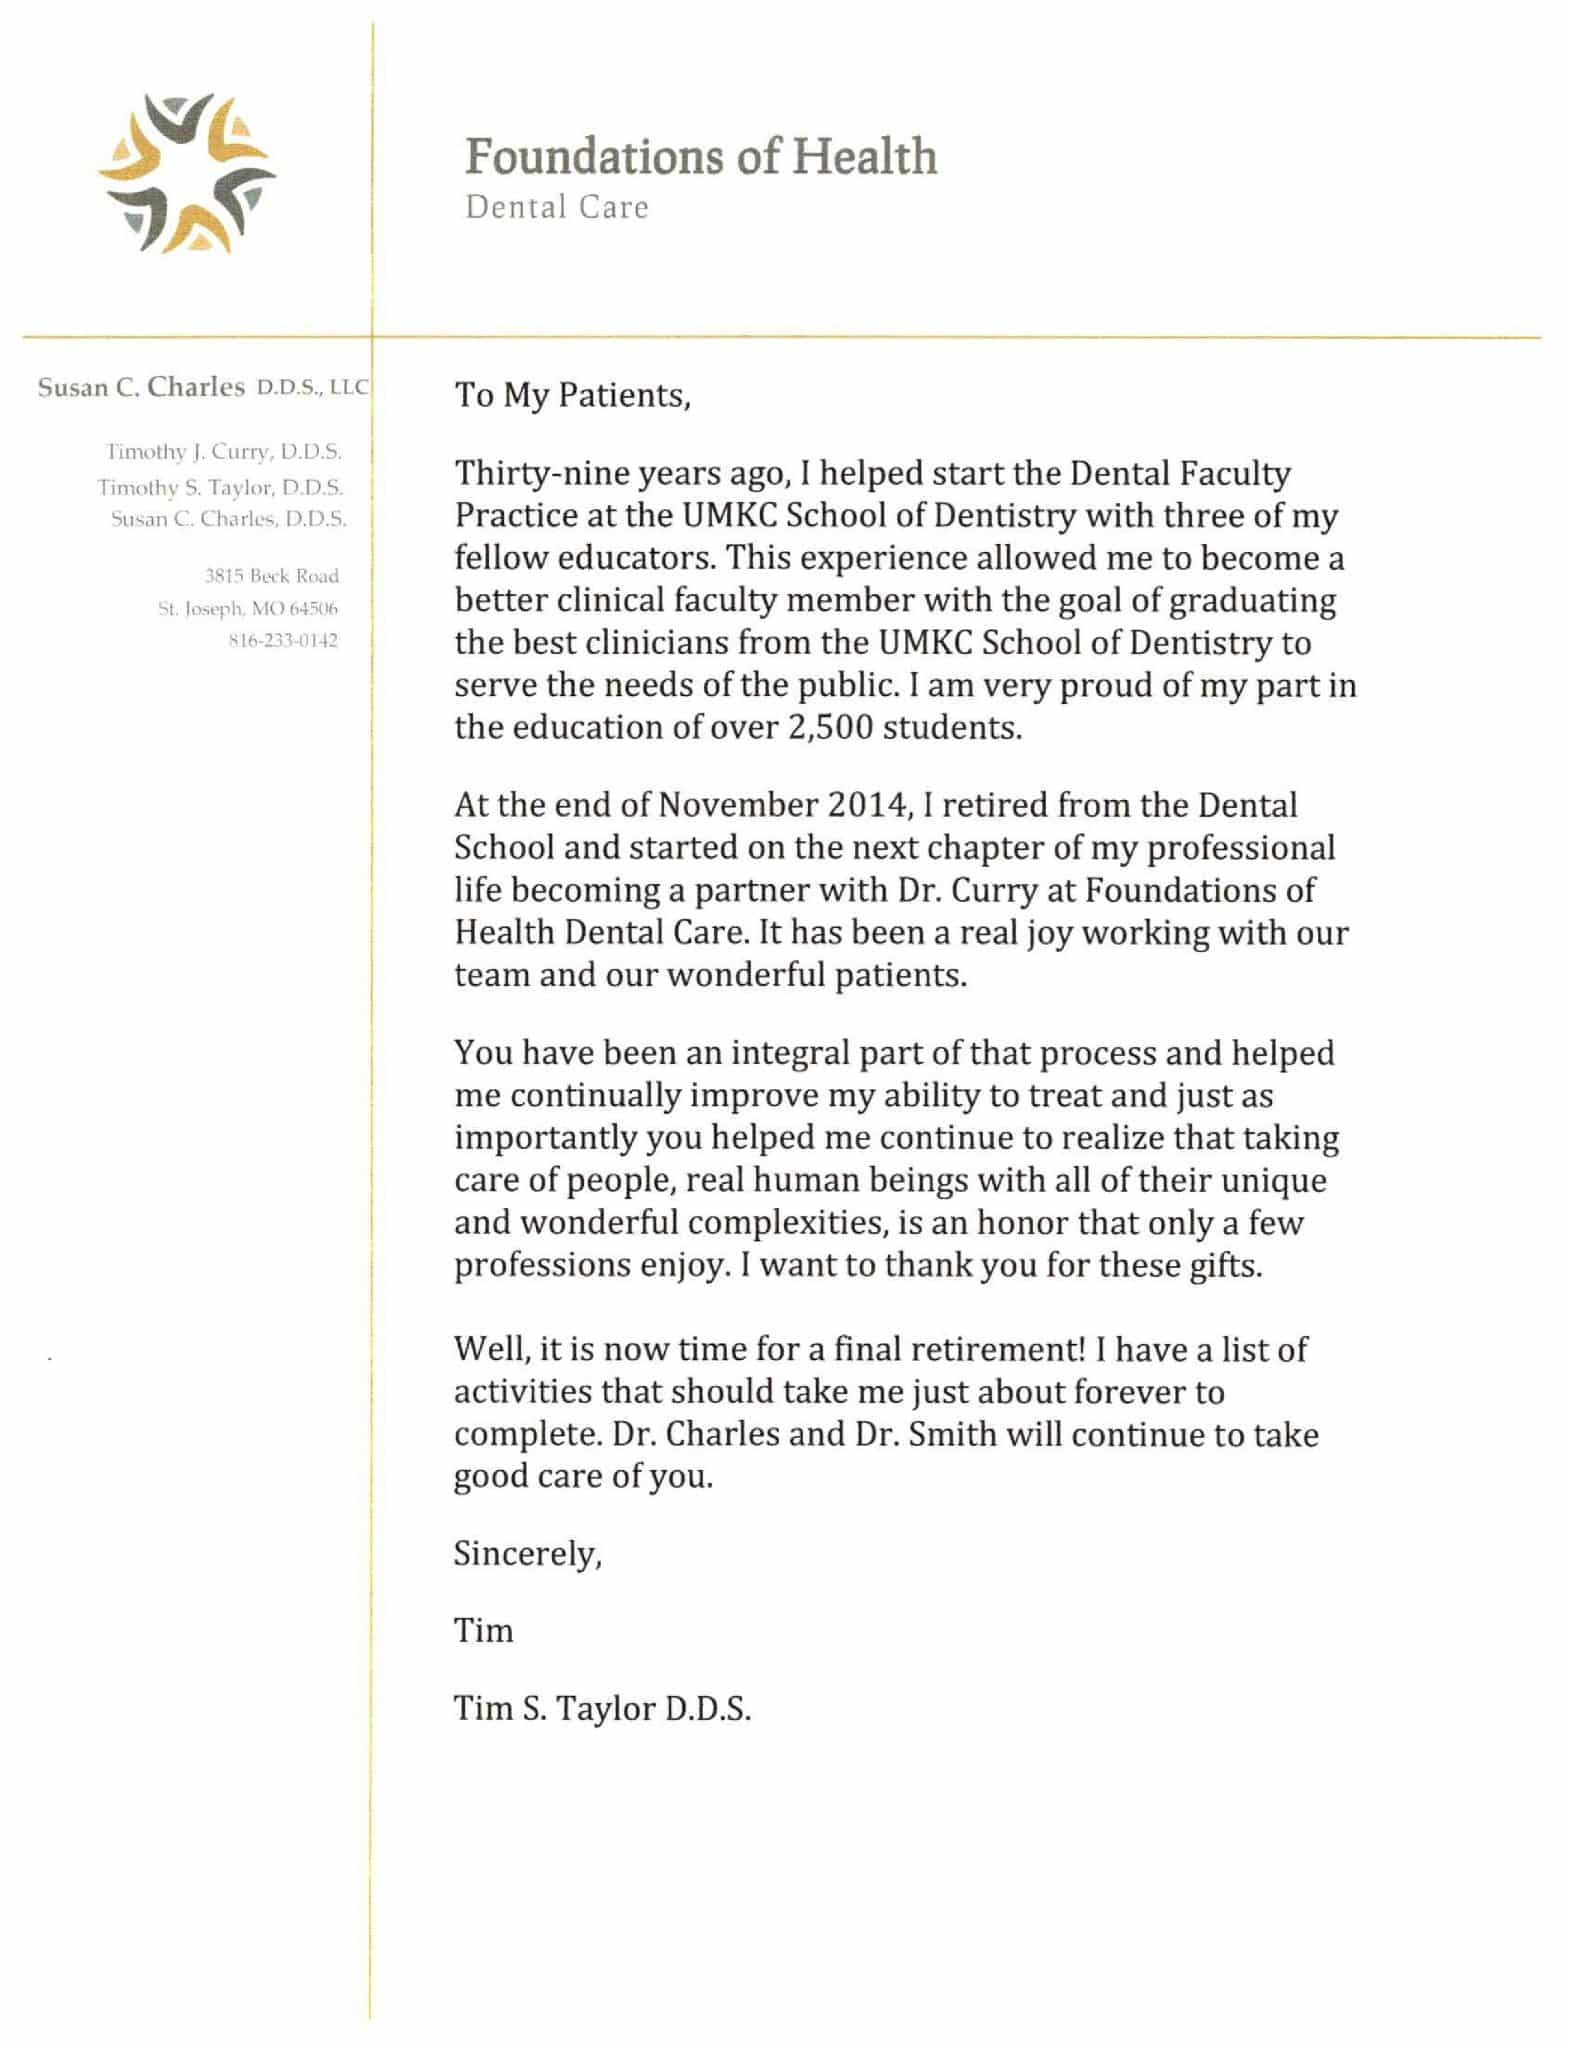 Dr. Taylor's retirement letter